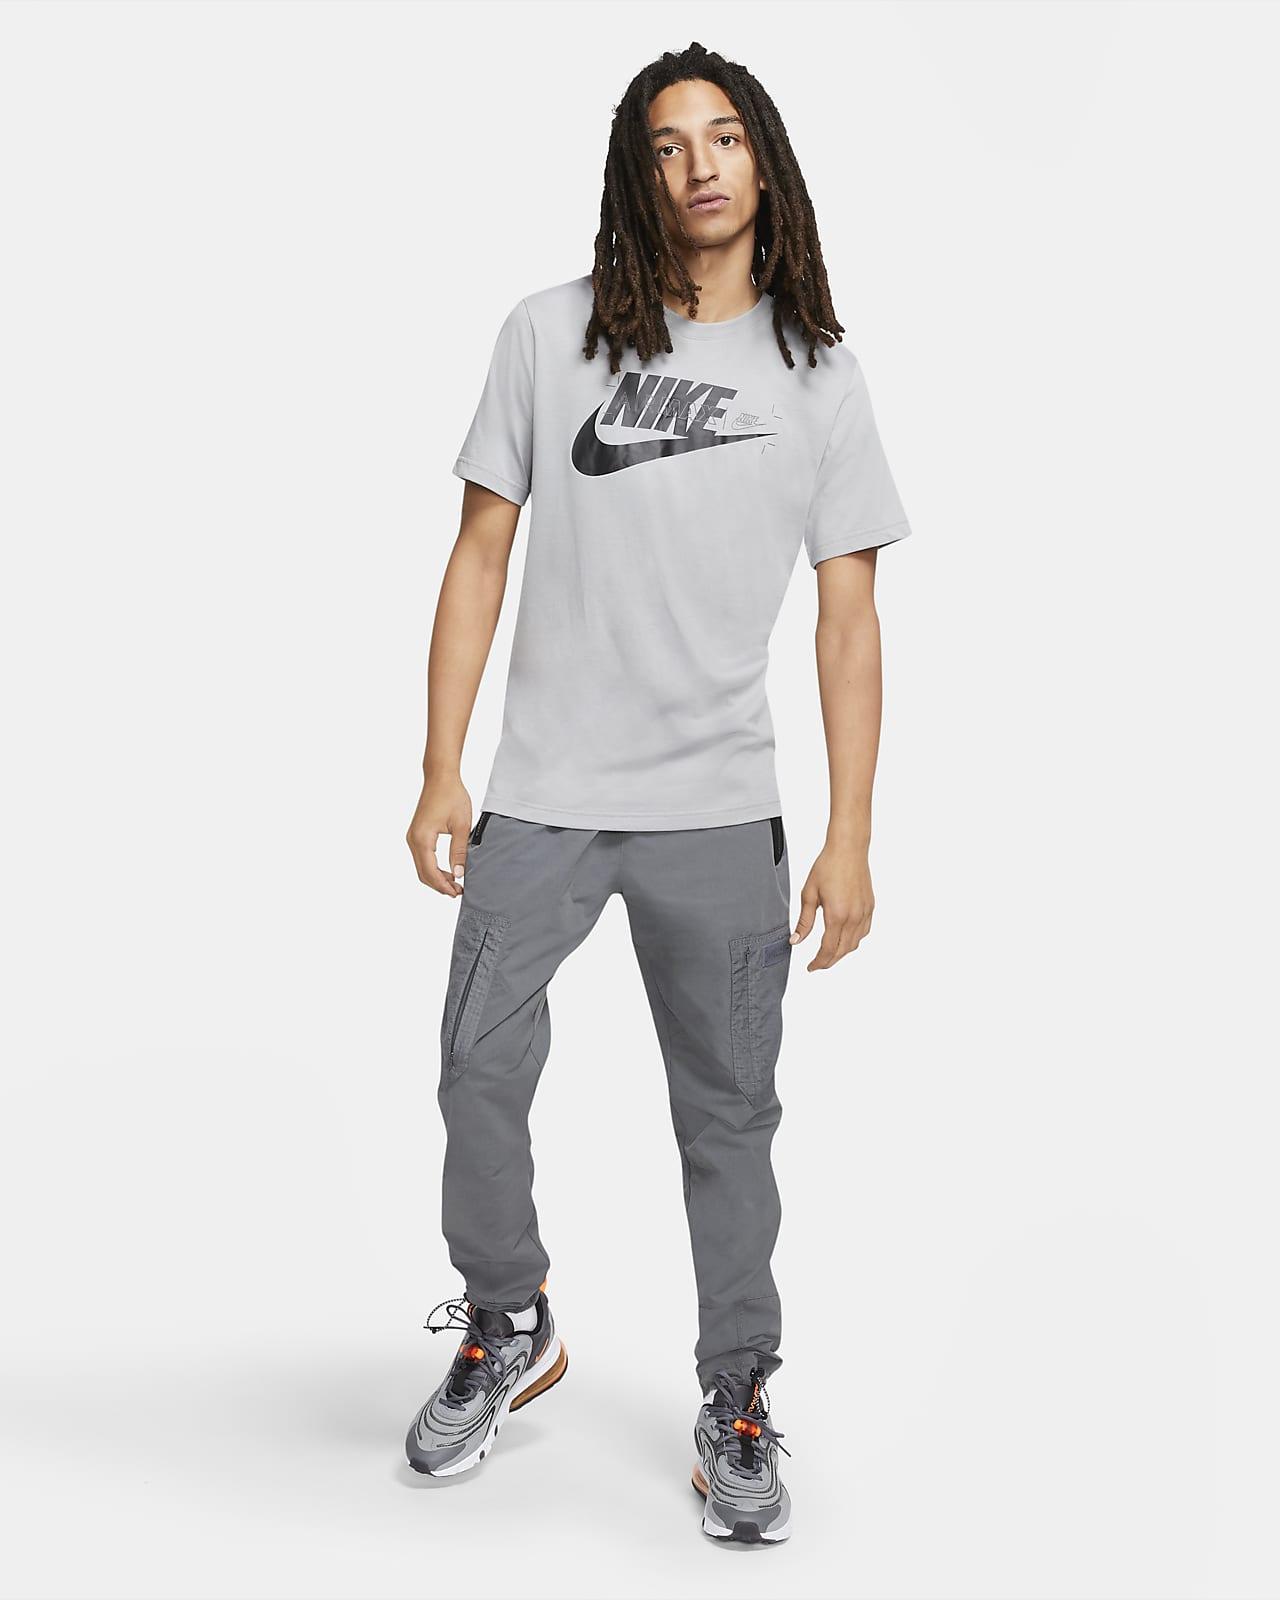 suma Reunión adyacente  Nike Sportswear Air Max Camiseta - Hombre. Nike ES